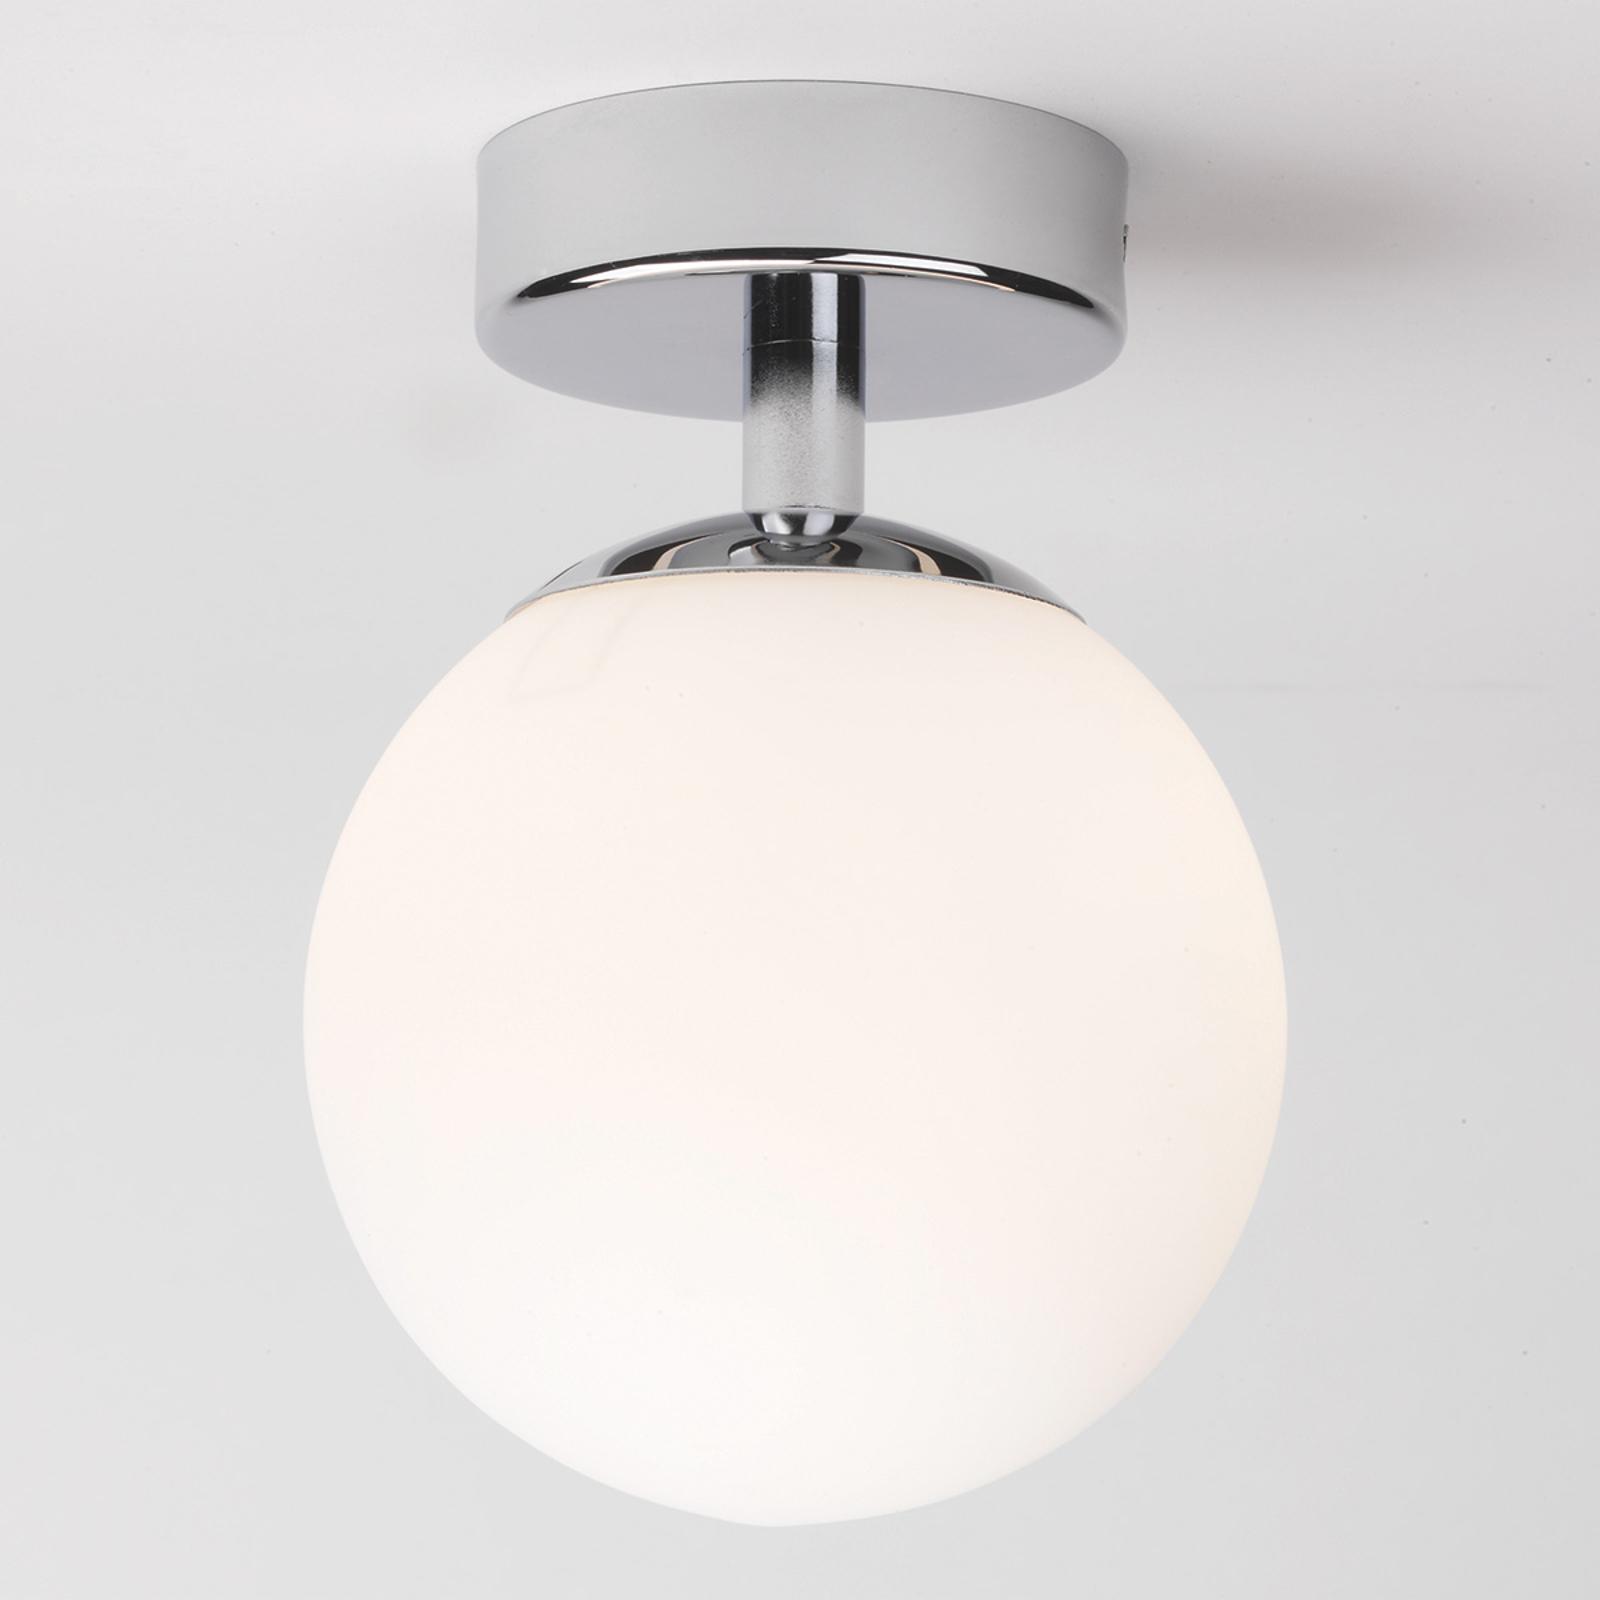 Decorative spherical ceiling light Denver_1020083_1